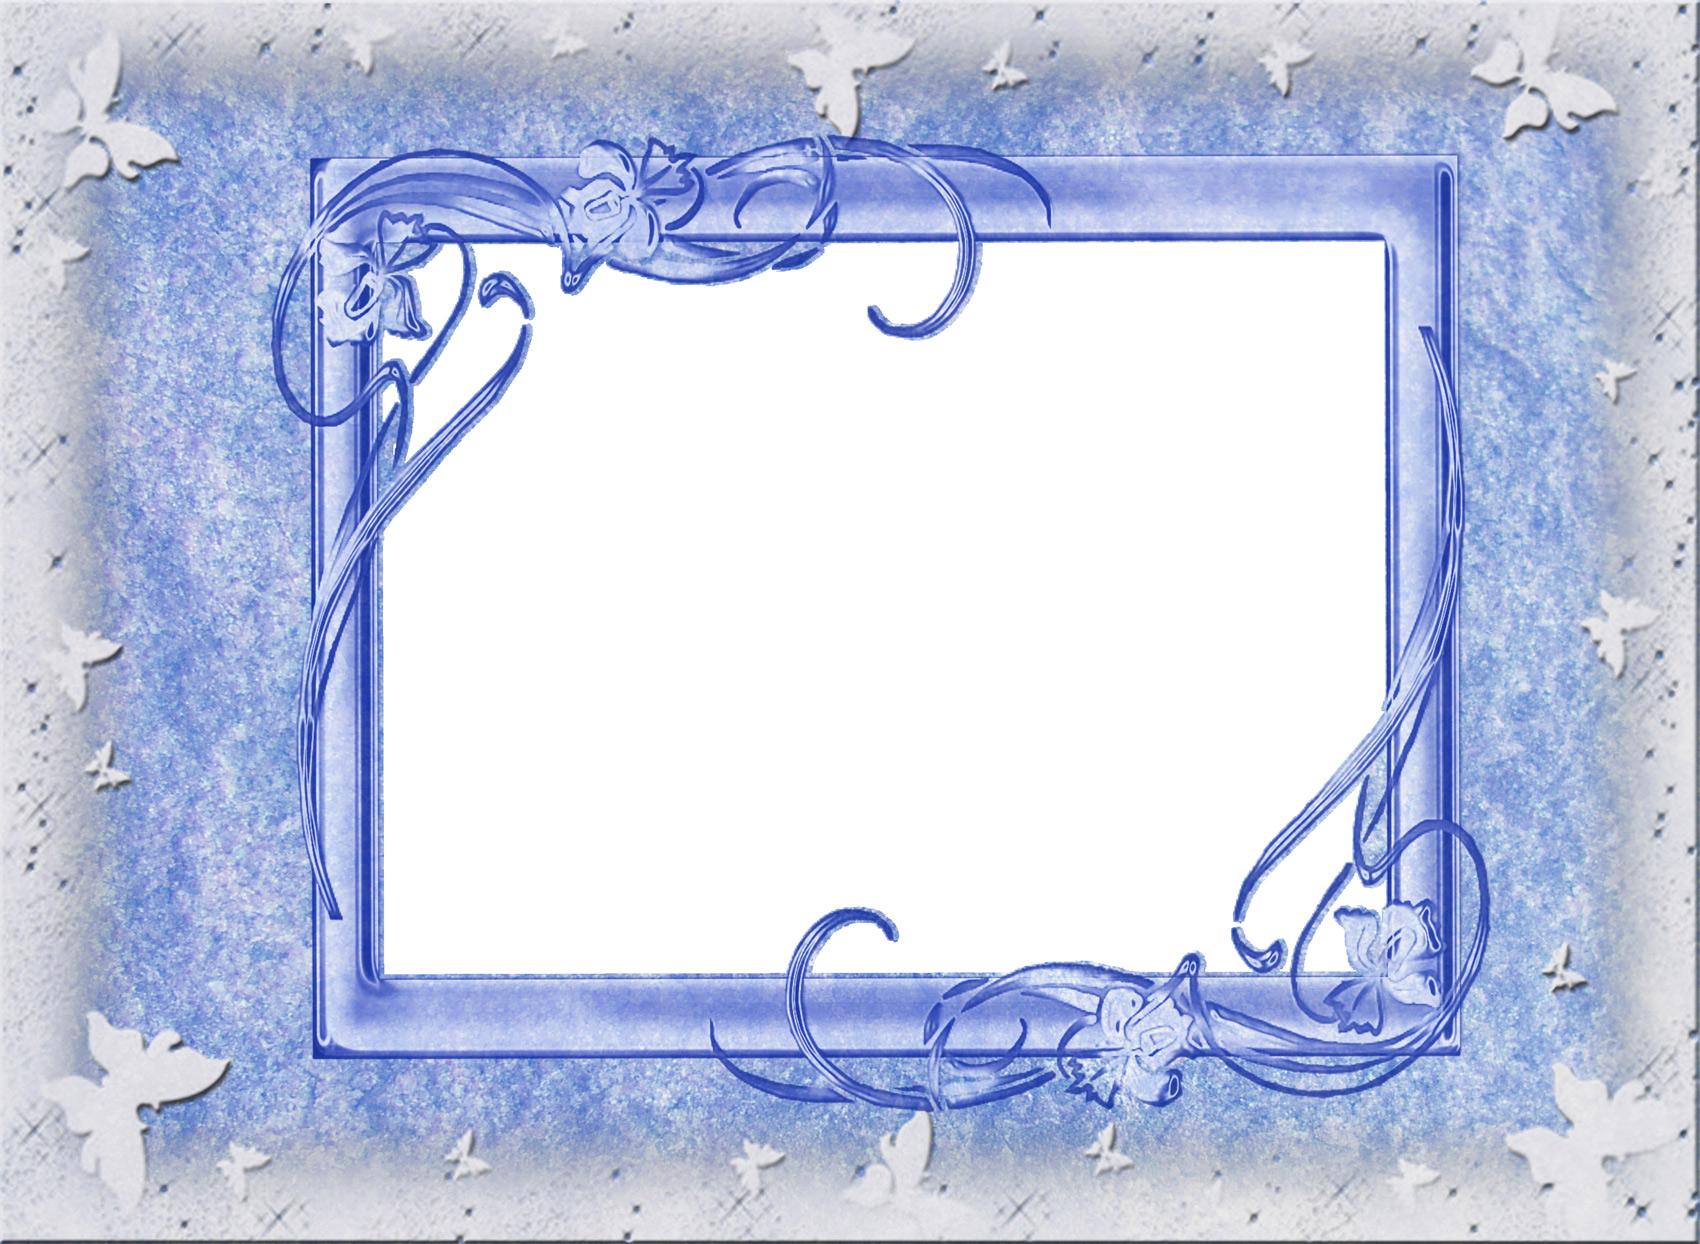 Фото рамки зима для мужчин